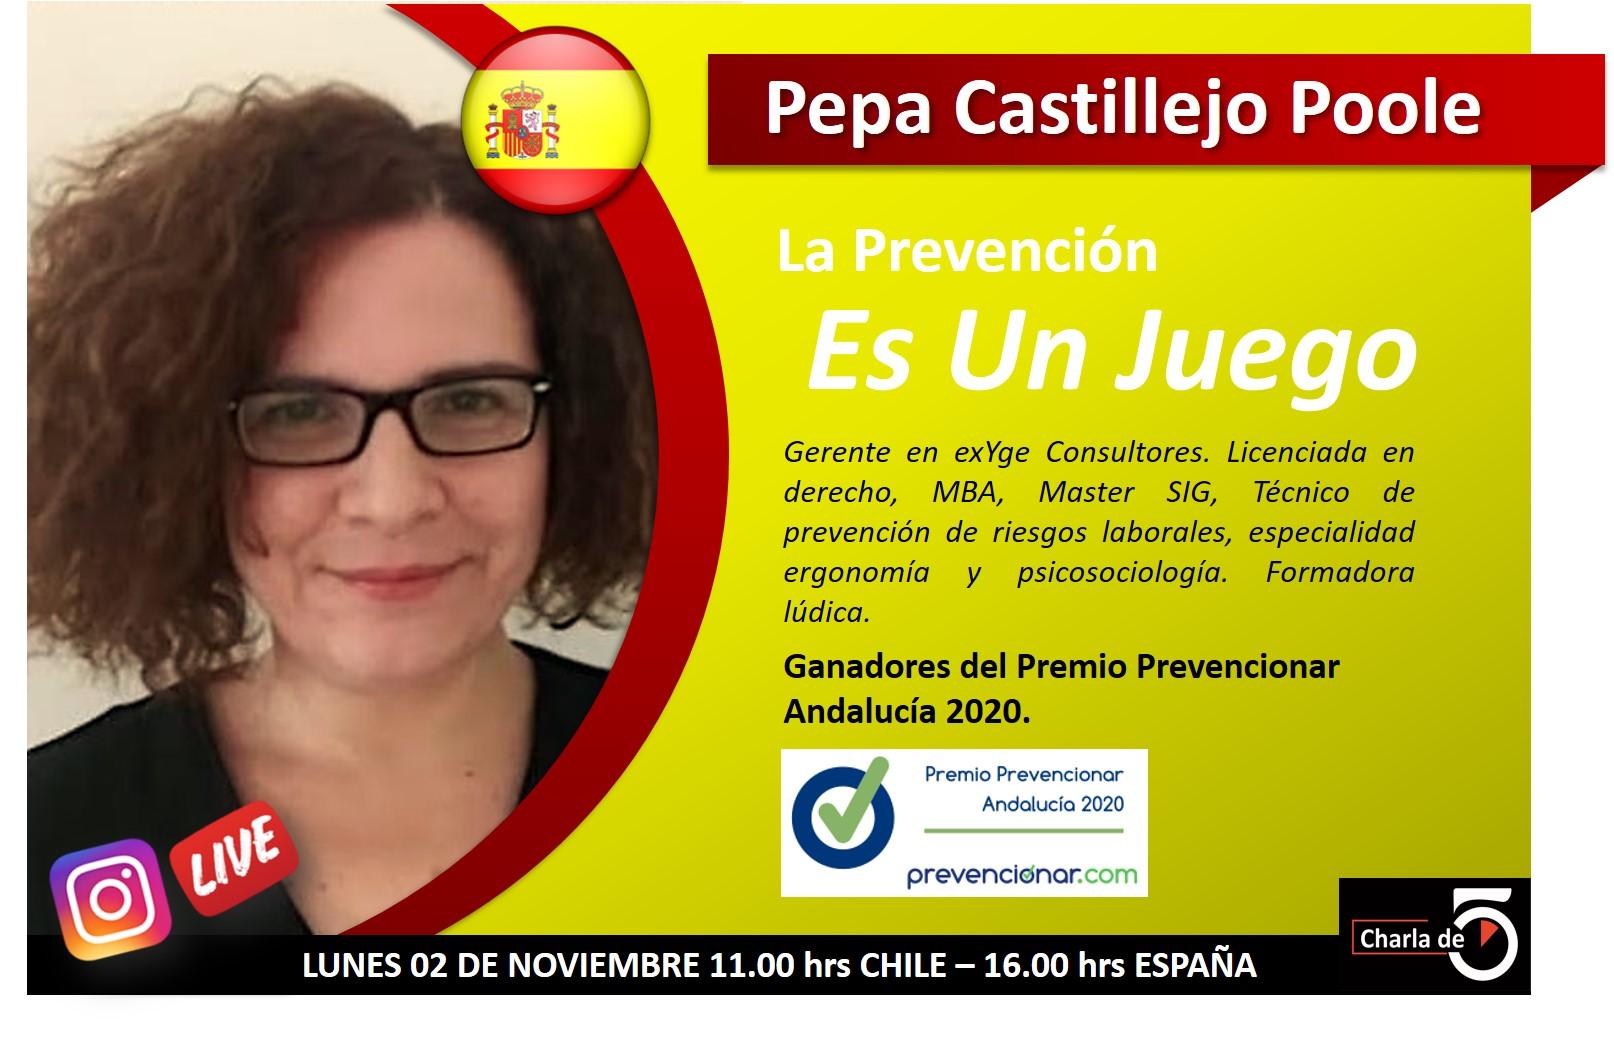 Pepa Castillejo Poole